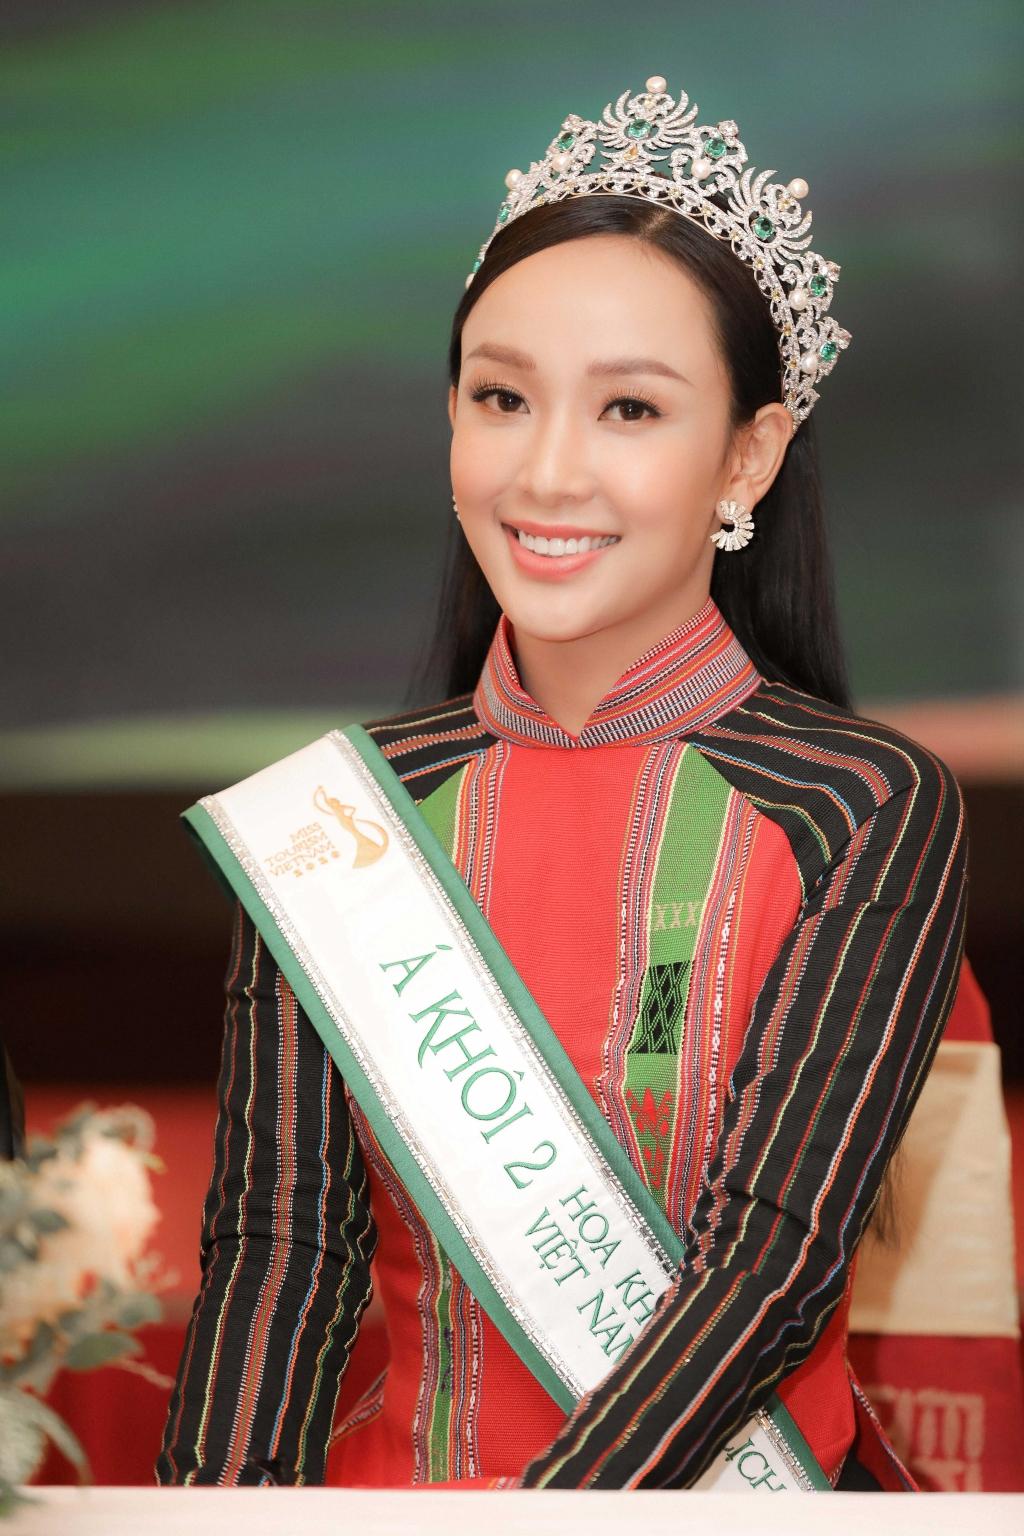 hai a khoi miss tourism bay to su bat ngo va ton trong quyet dinh ban giam khao